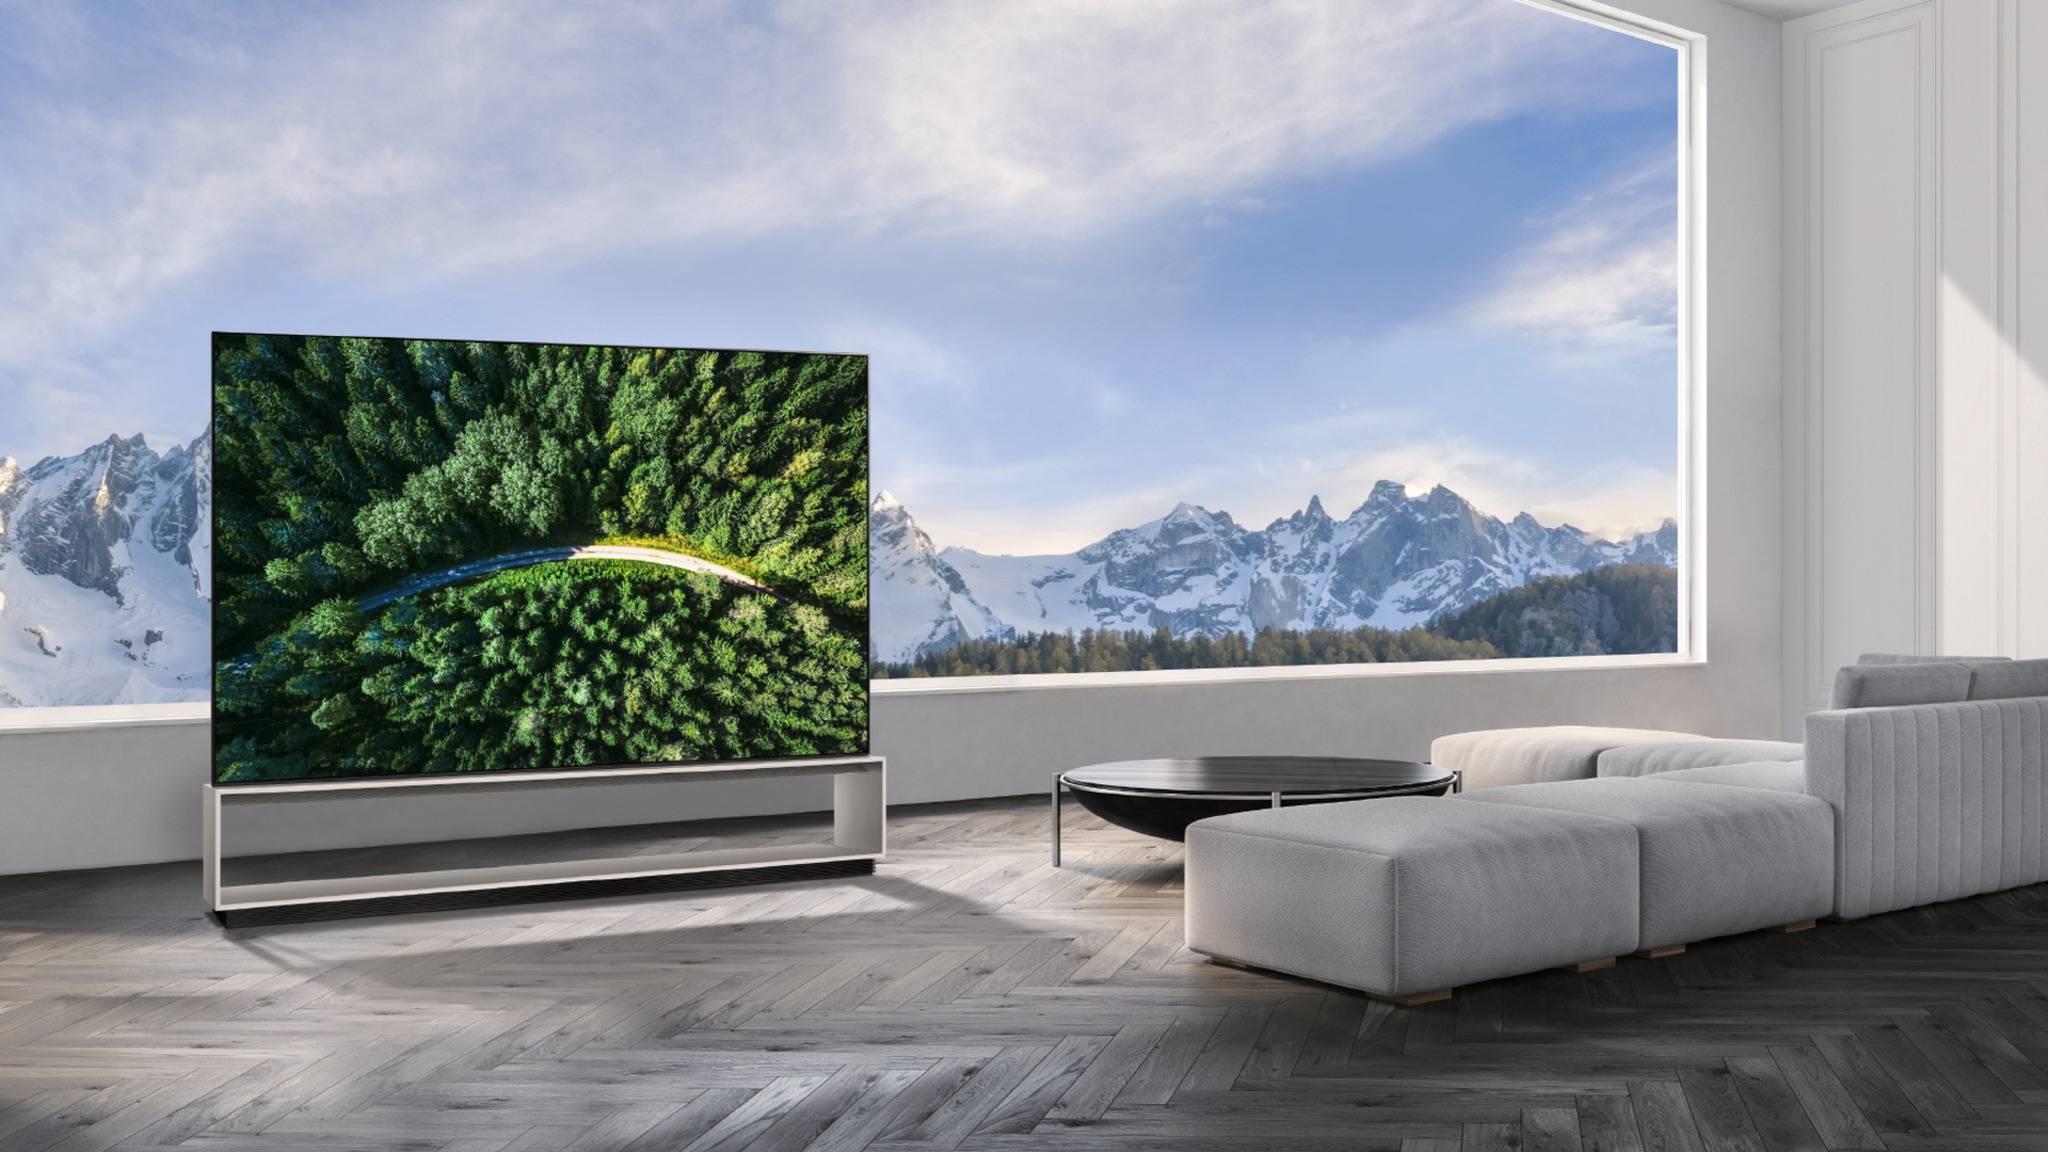 lg-signature-oled-8k-tv